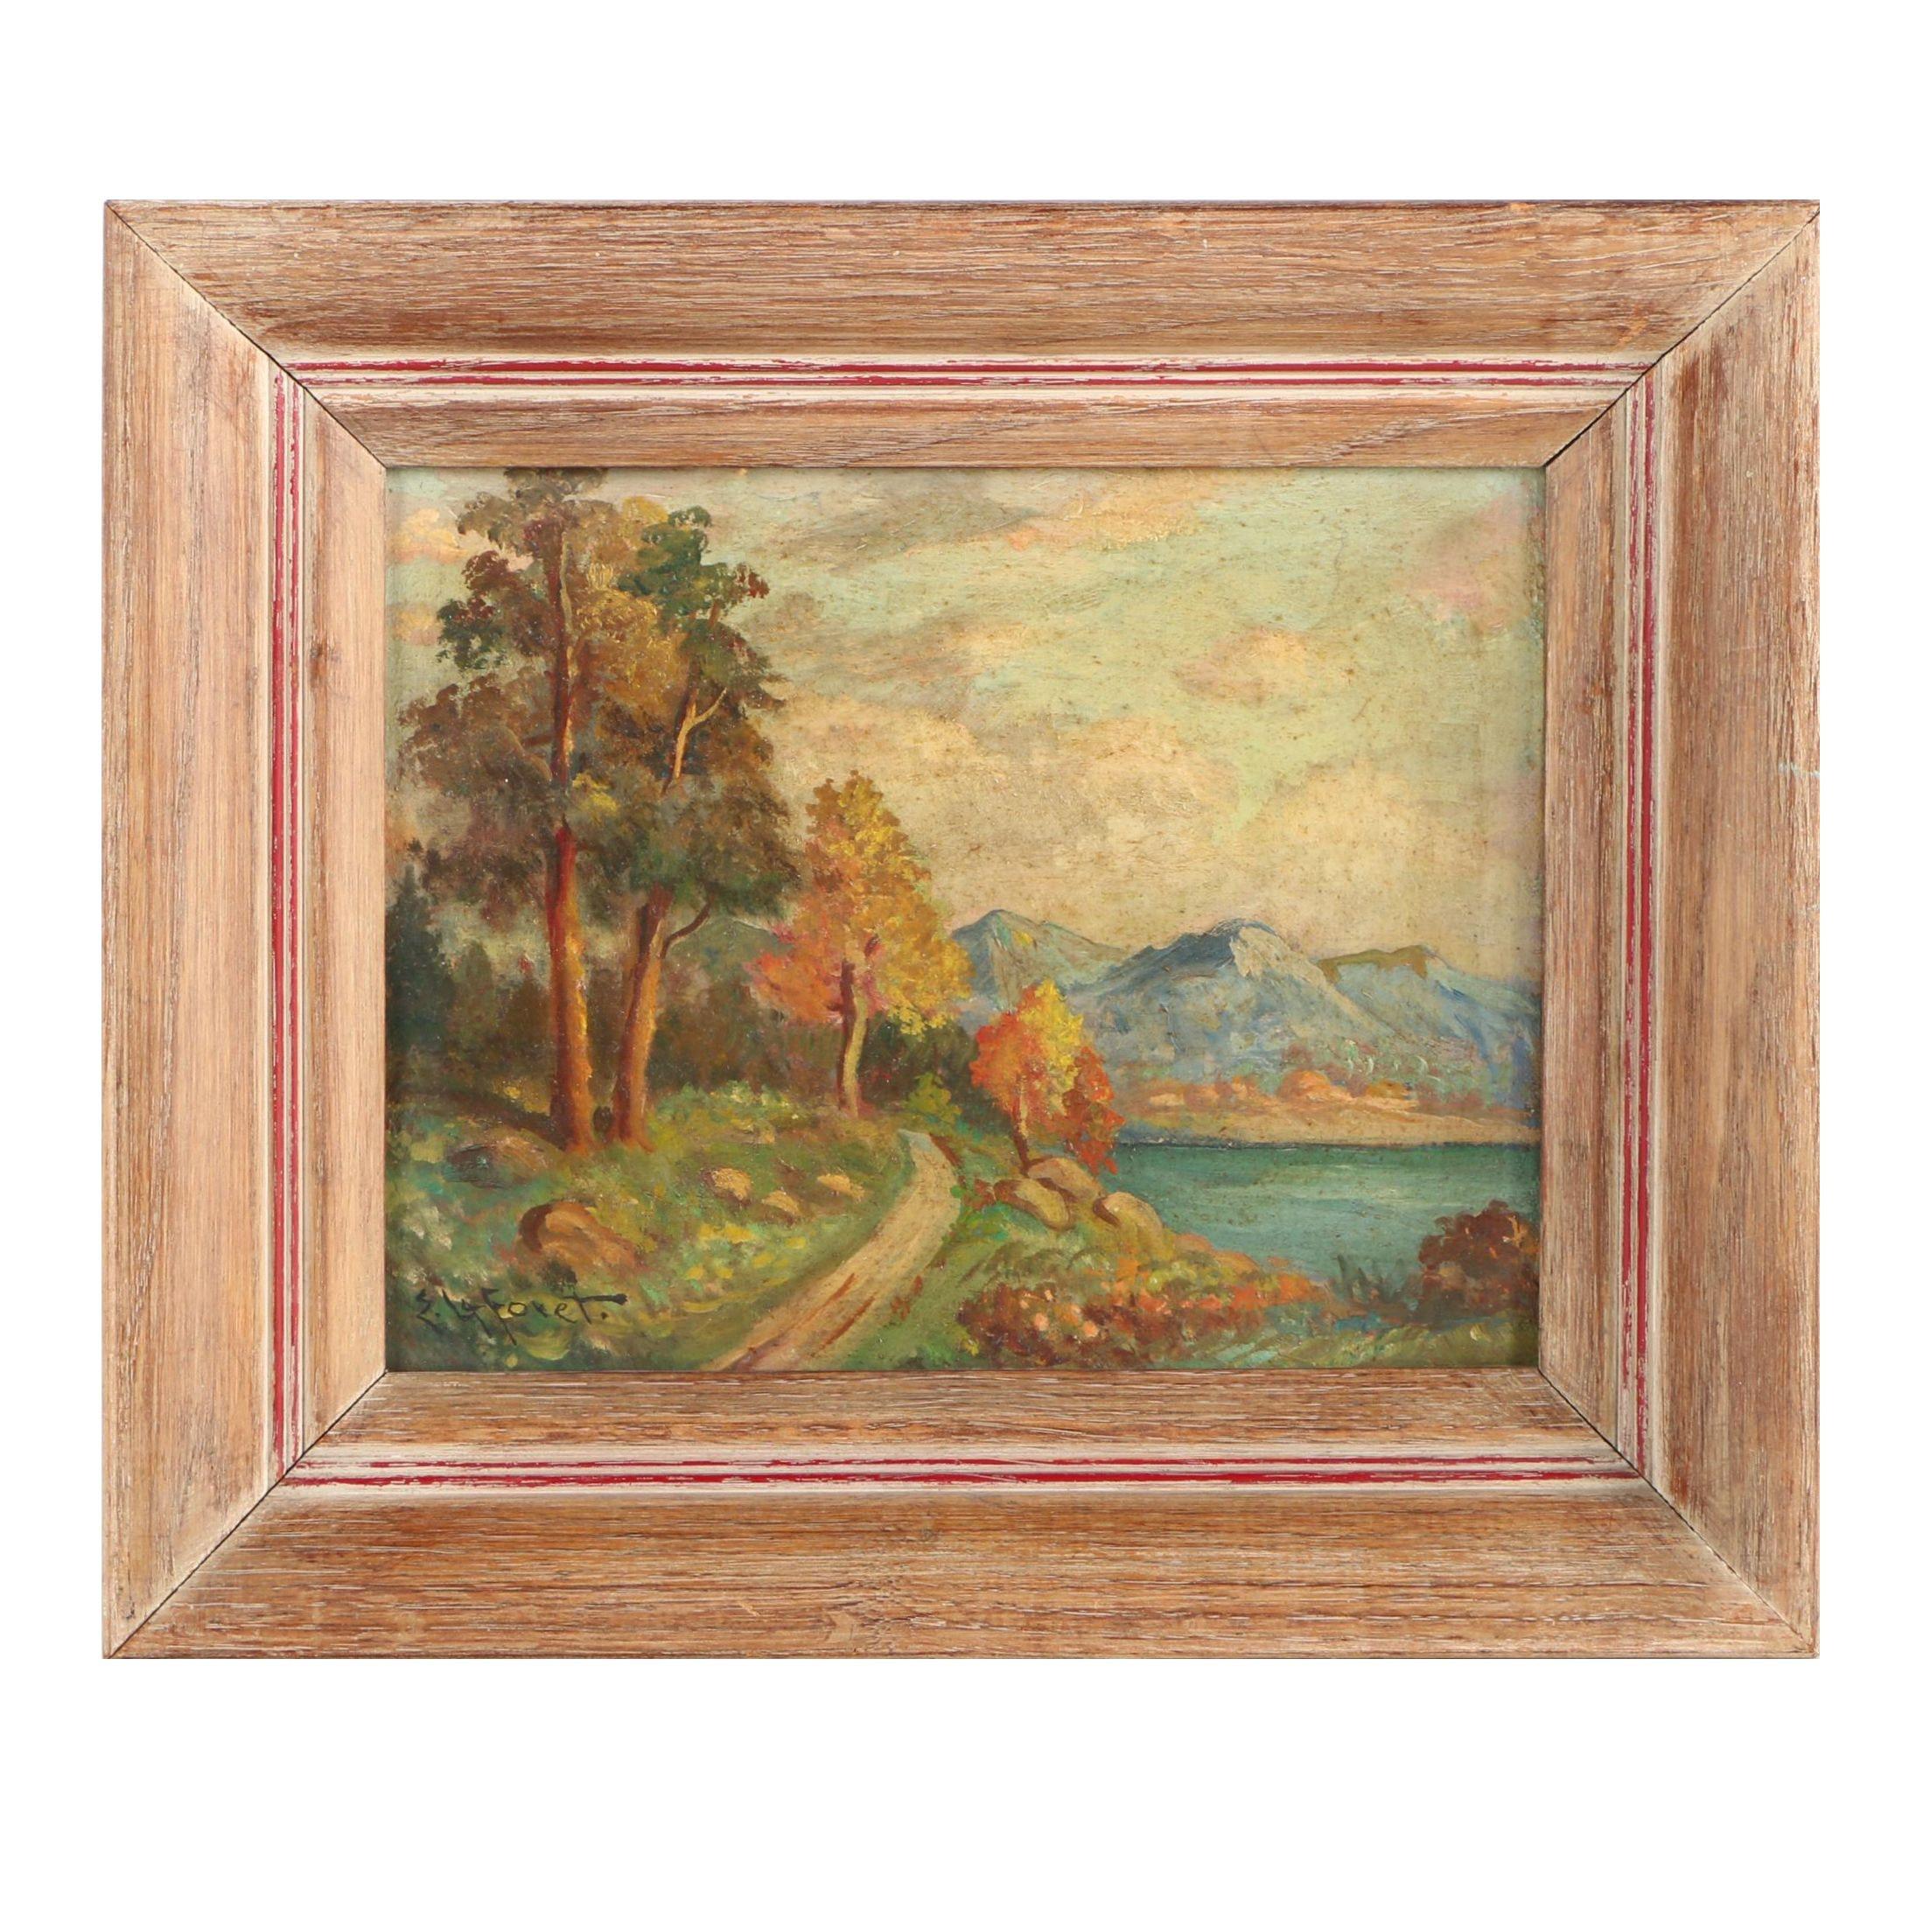 Eugene LaForet Oil Painting of Nature Scene